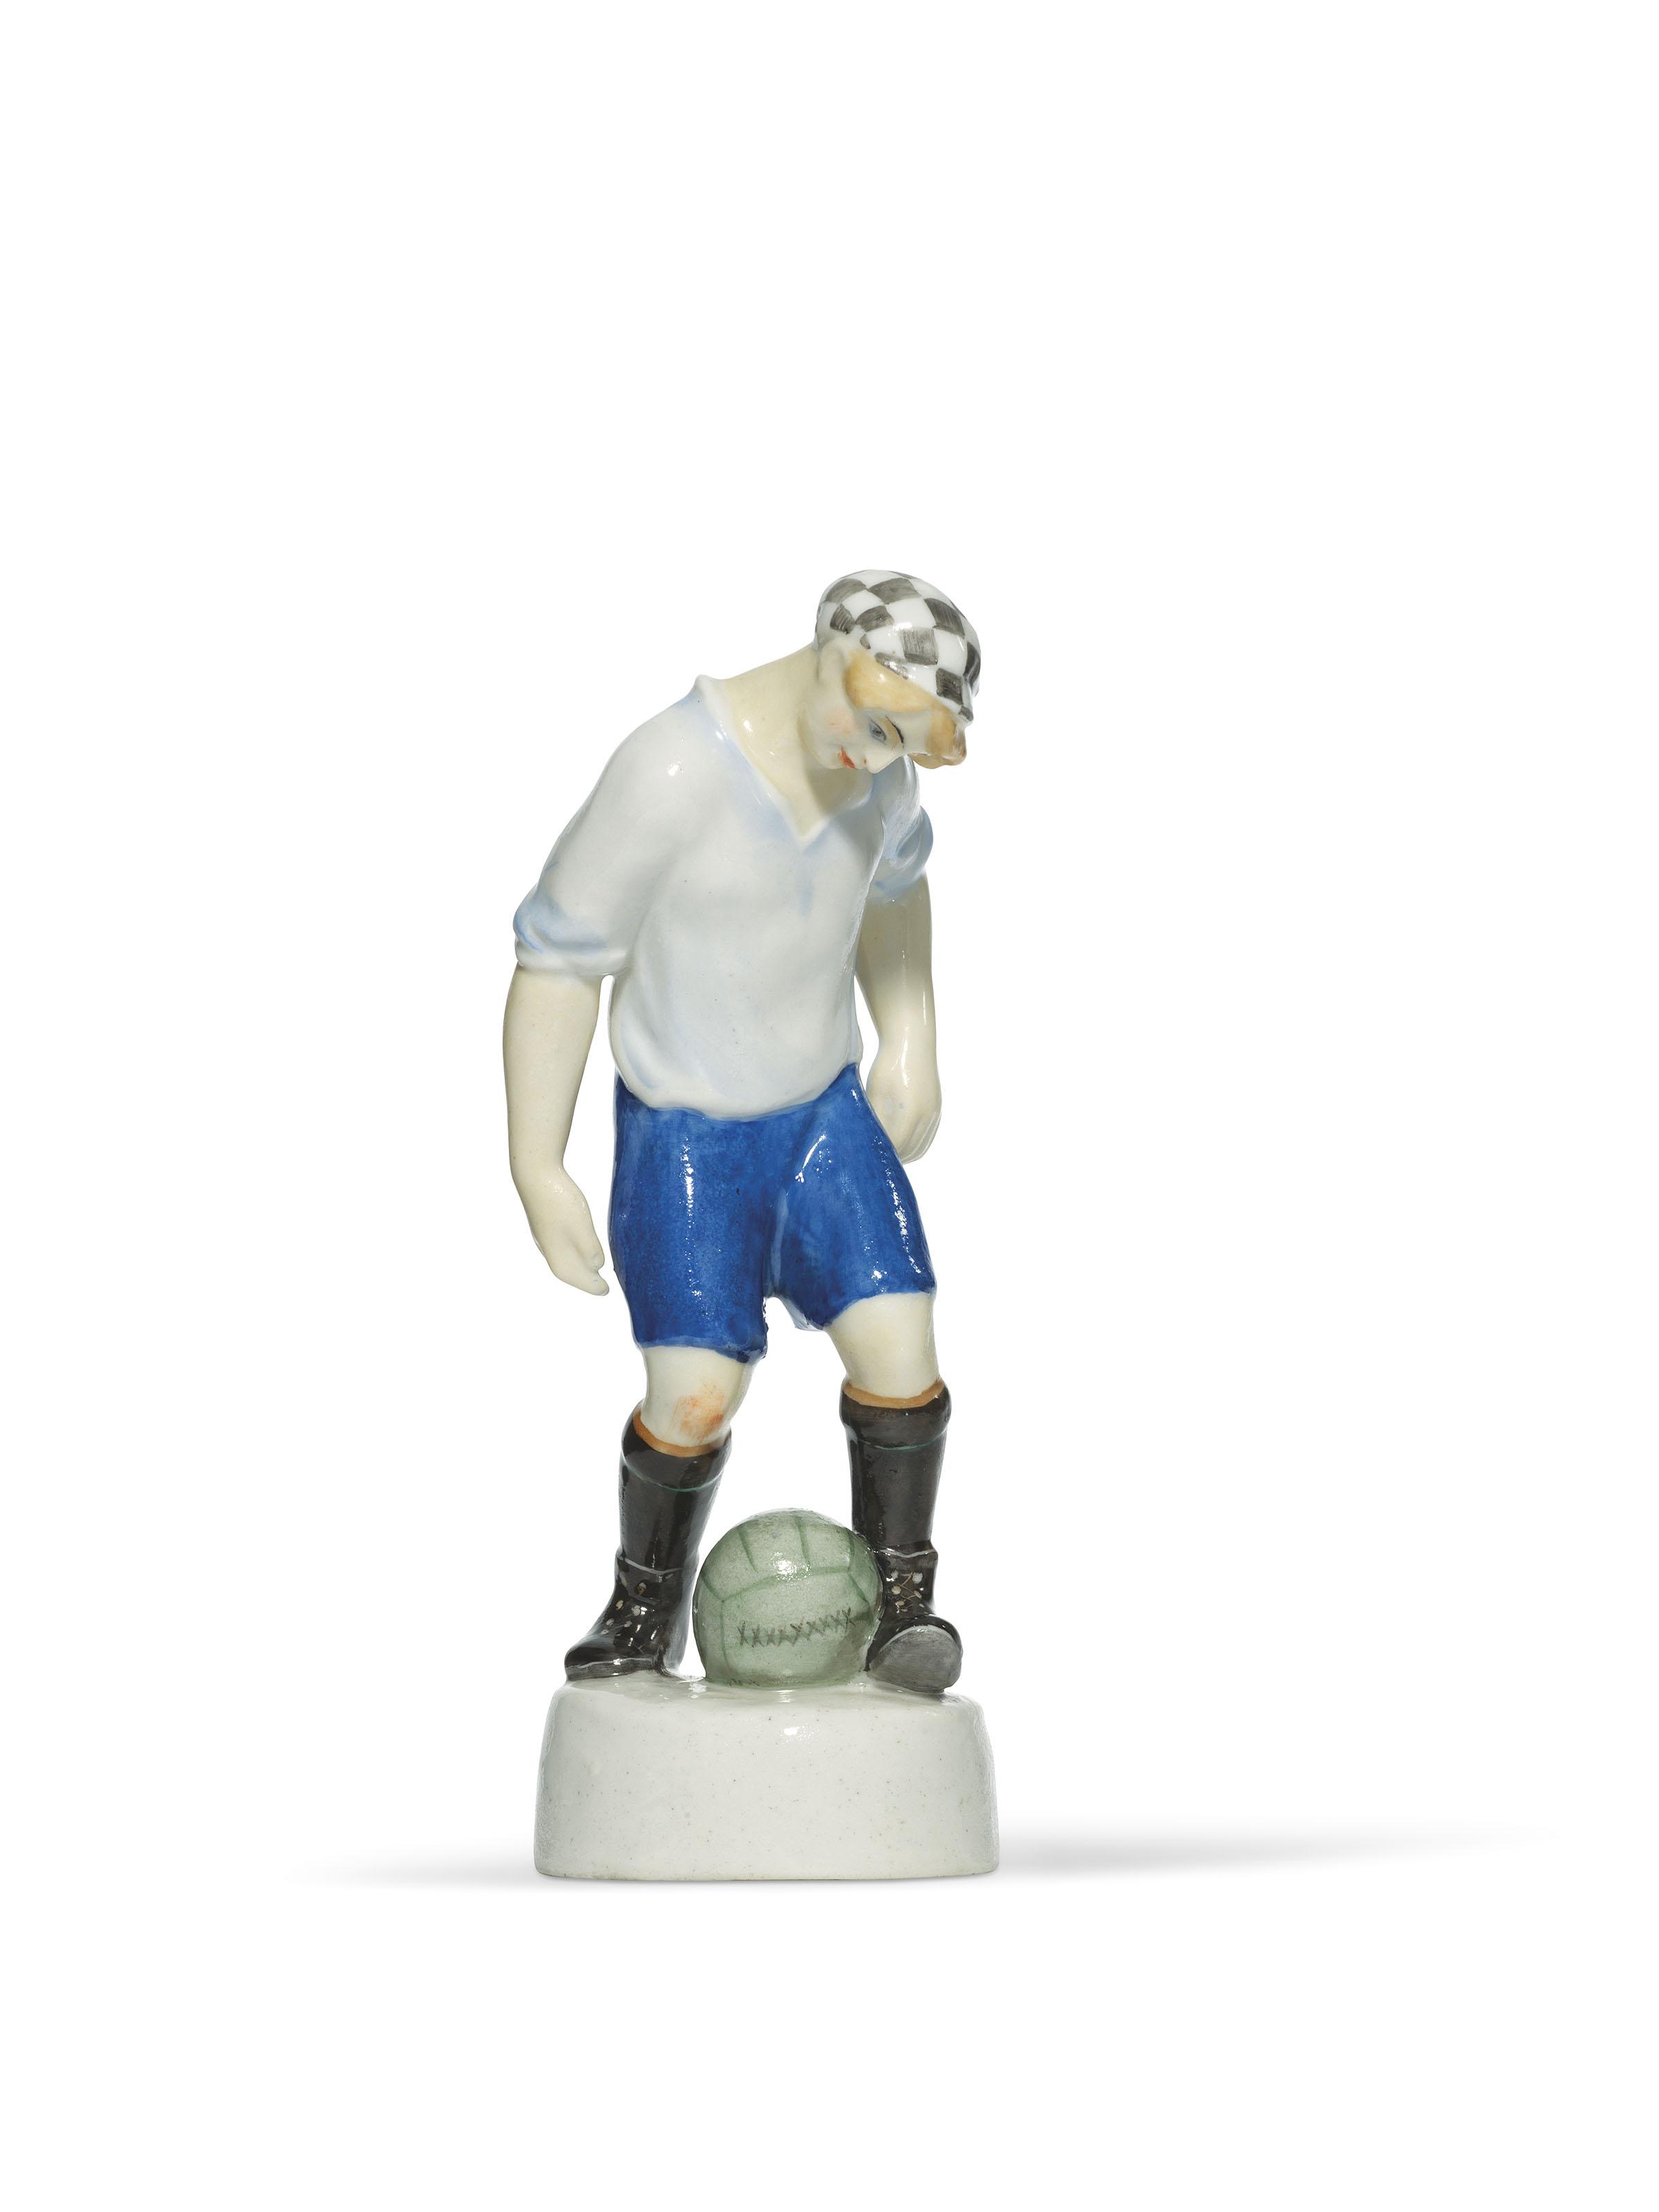 A SOVIET PROPAGANDA PORCELAIN FIGURE OF A FOOTBALLER